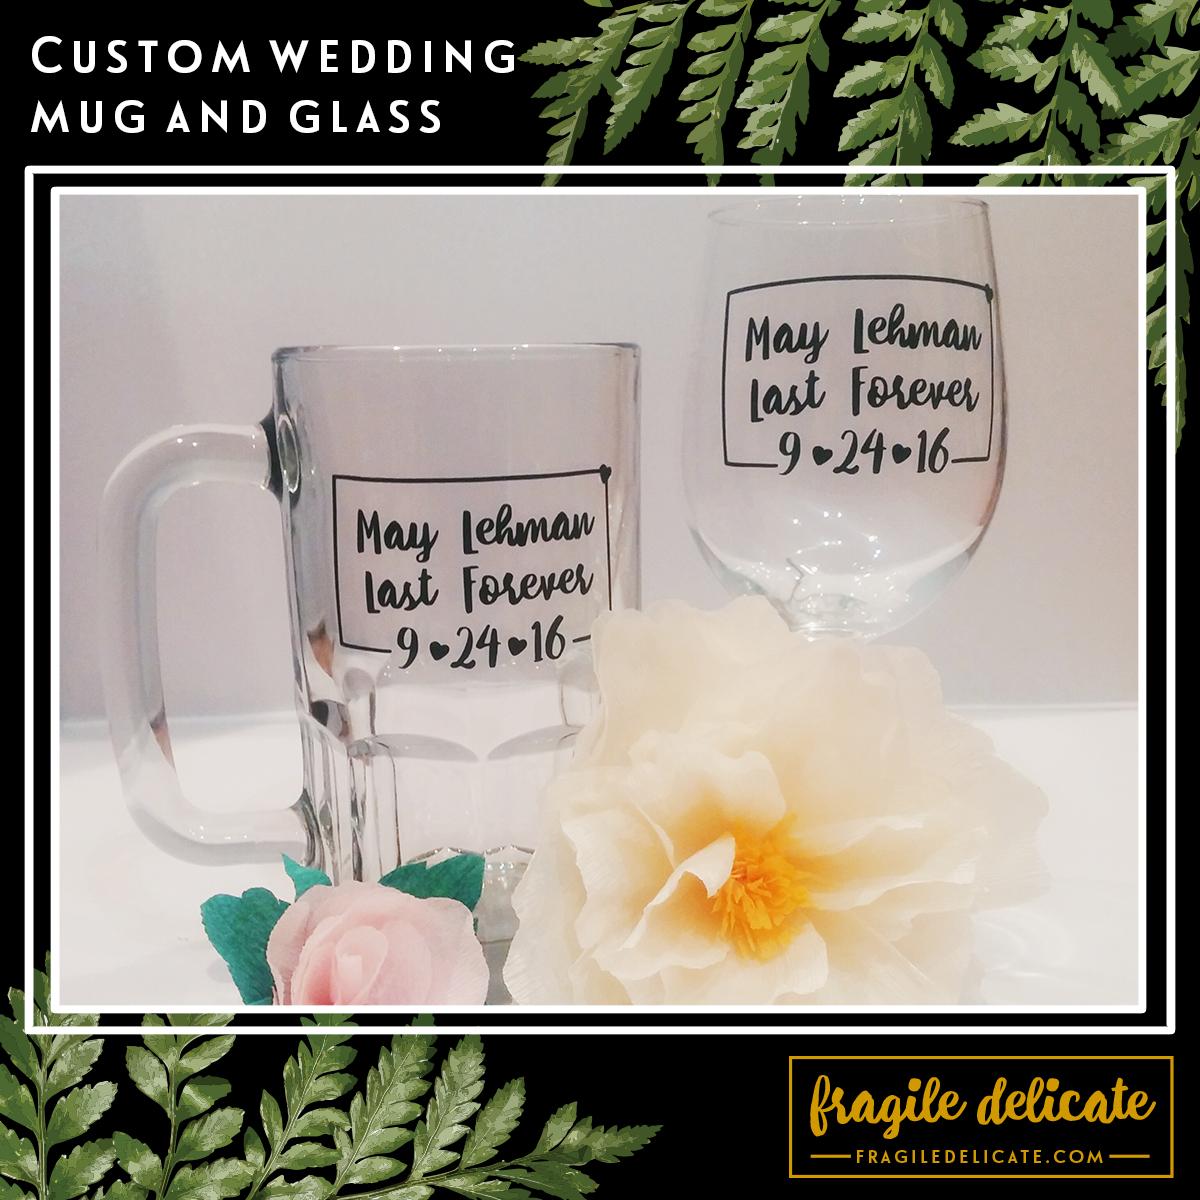 Fragile Delicate - Custom Beer Mug and Wine Glass